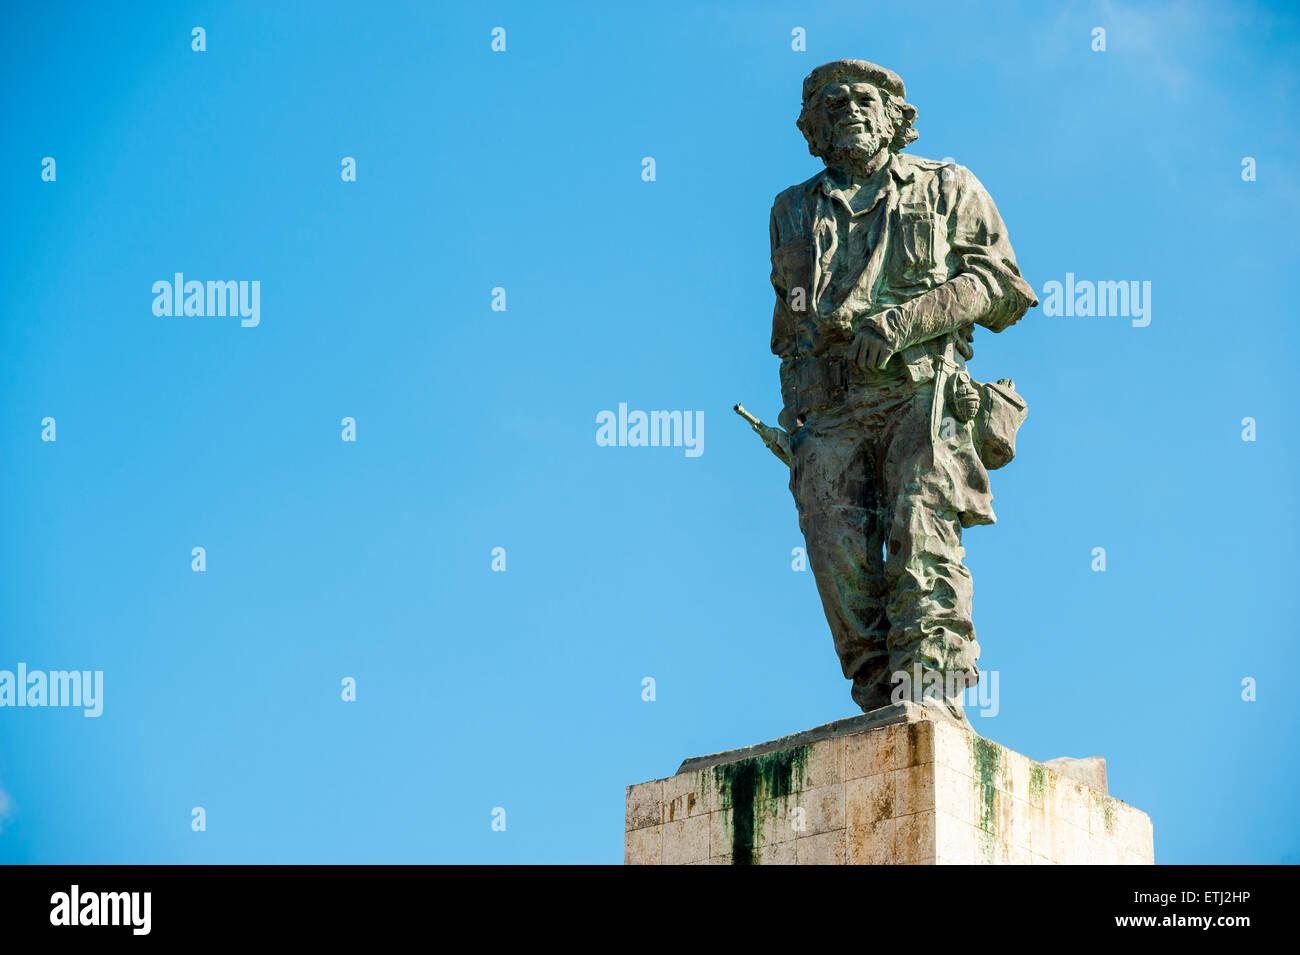 SANTA CLARA, Kuba - 28. Mai 2011: Statue des kubanischen Revolutionär Che Guevara steht in blauer Himmel auf Stockbild